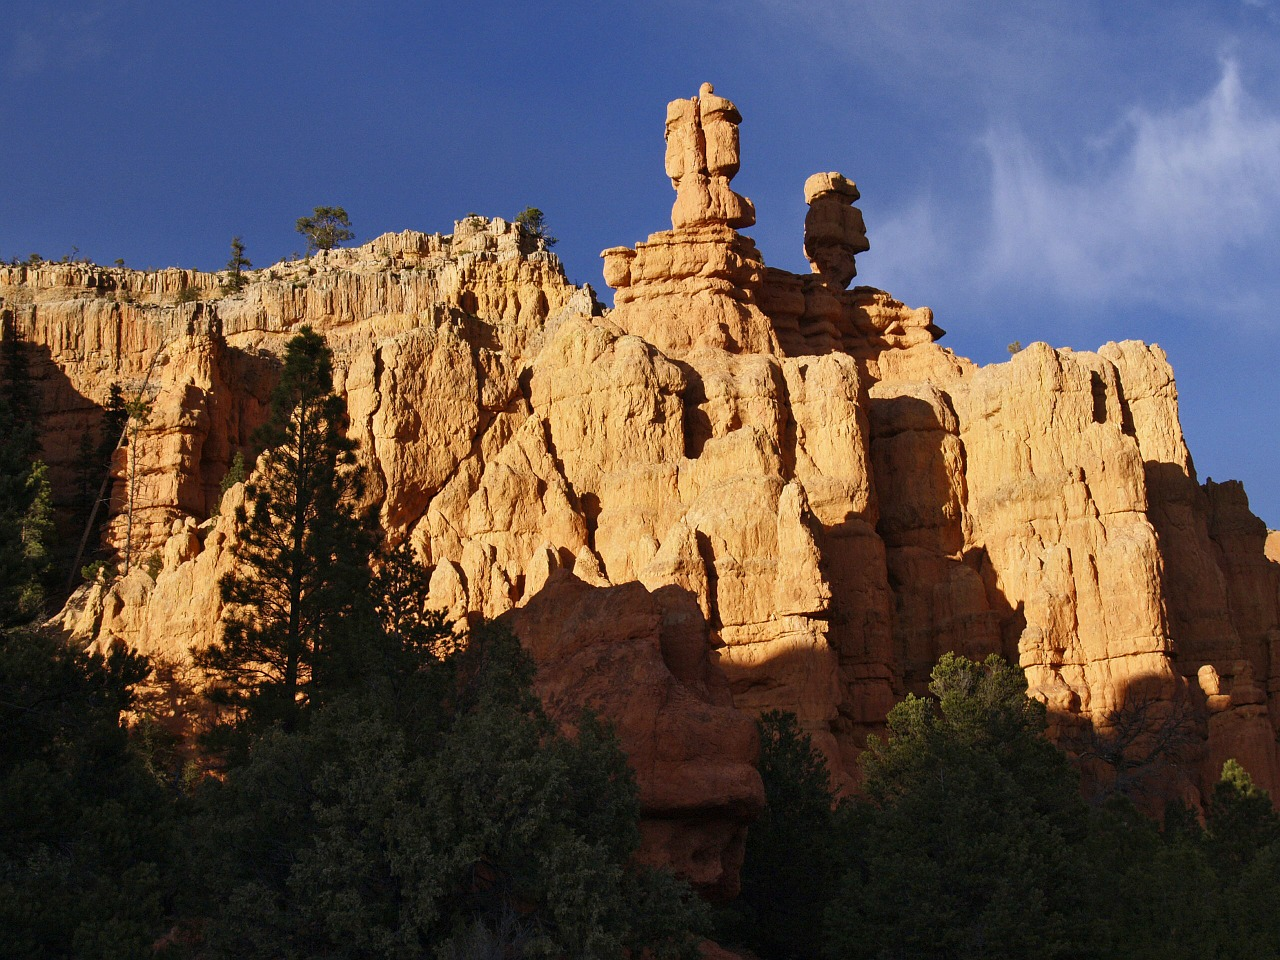 balanced-rocks-53711_1280